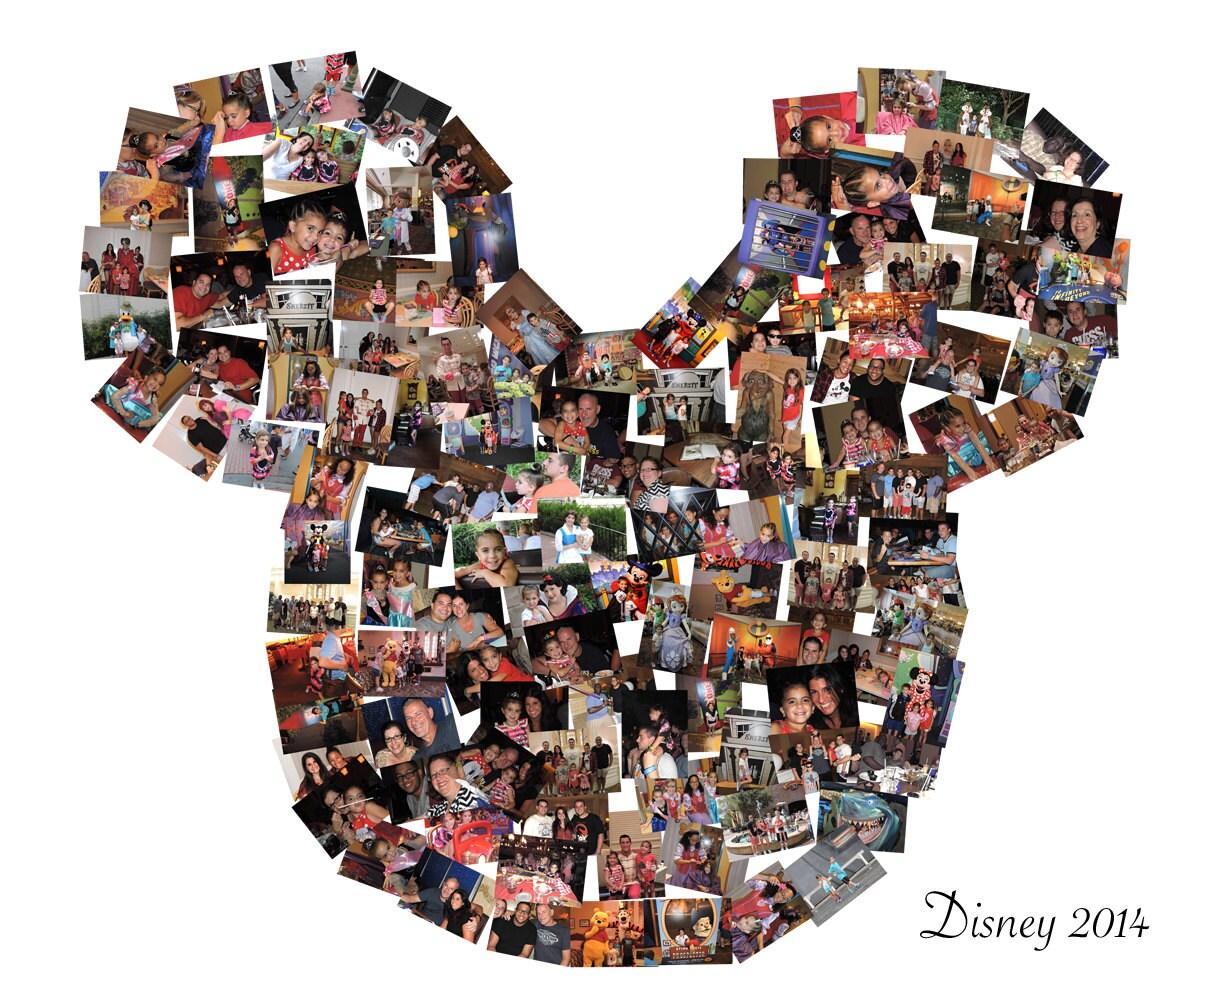 Disney collage mickey mouse ears custom canvas mosaic collage zoom jeuxipadfo Choice Image